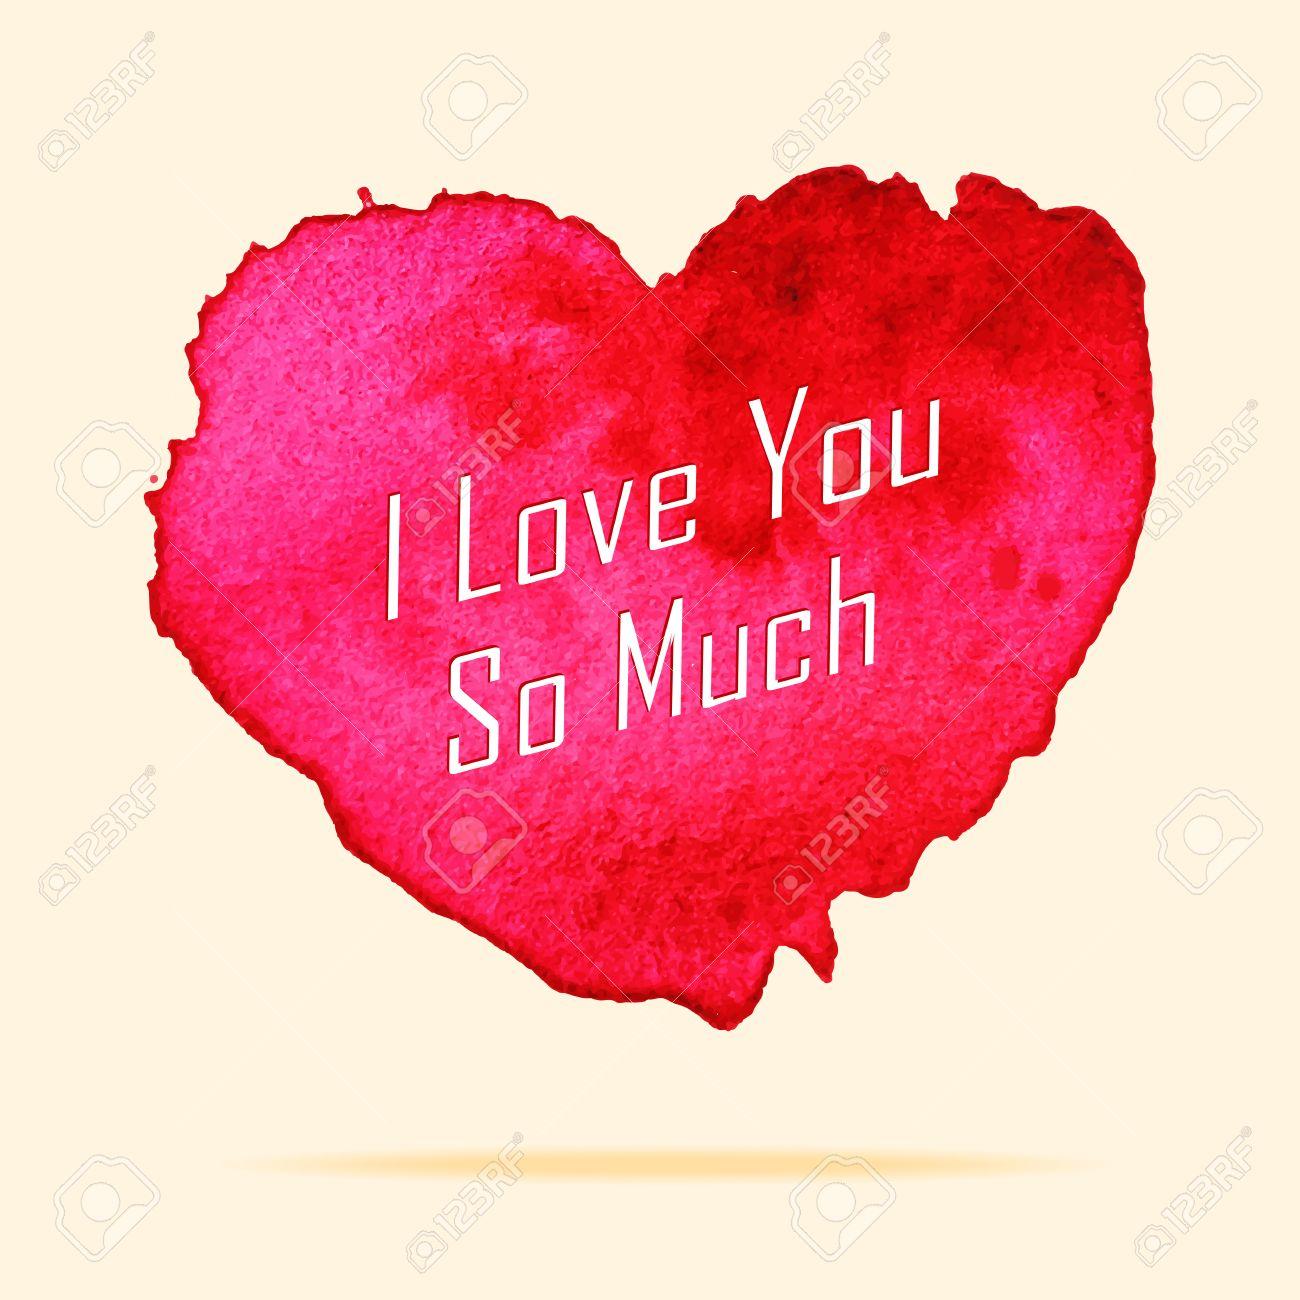 Ich liebe dich so sehr